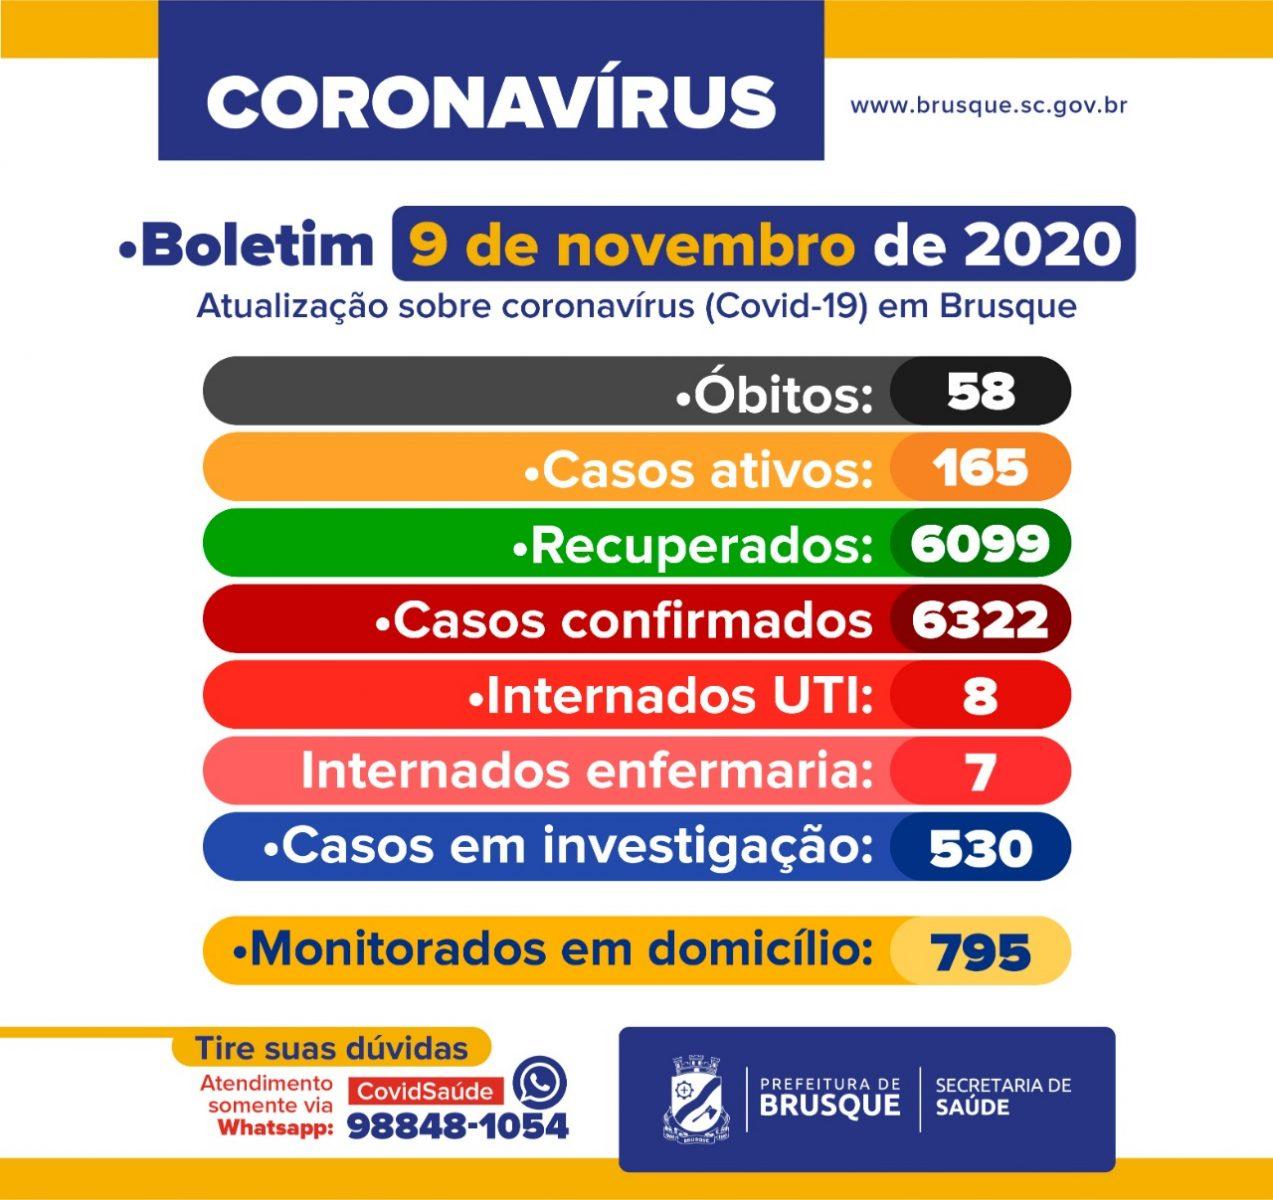 Covid-19: Confira o boletim epidemiológico desta segunda-feira (09)